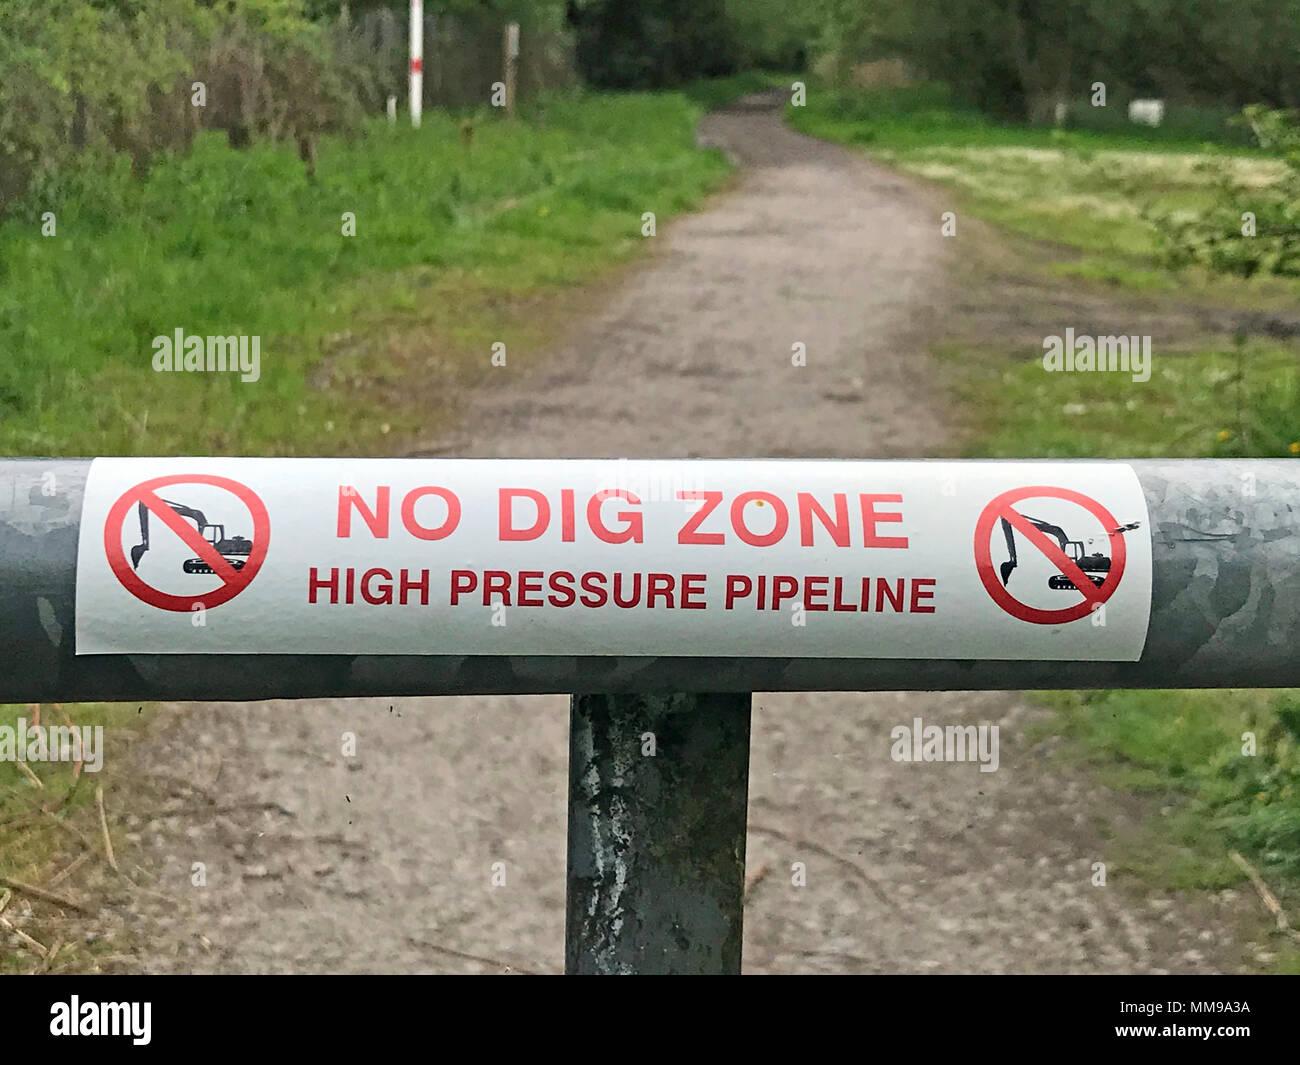 Laden Sie dieses Alamy Stockfoto No Dig Zone, Hochdruck, Pipeline, Walton, Warrington, Cheshire, WA 1, England - MM9A3A